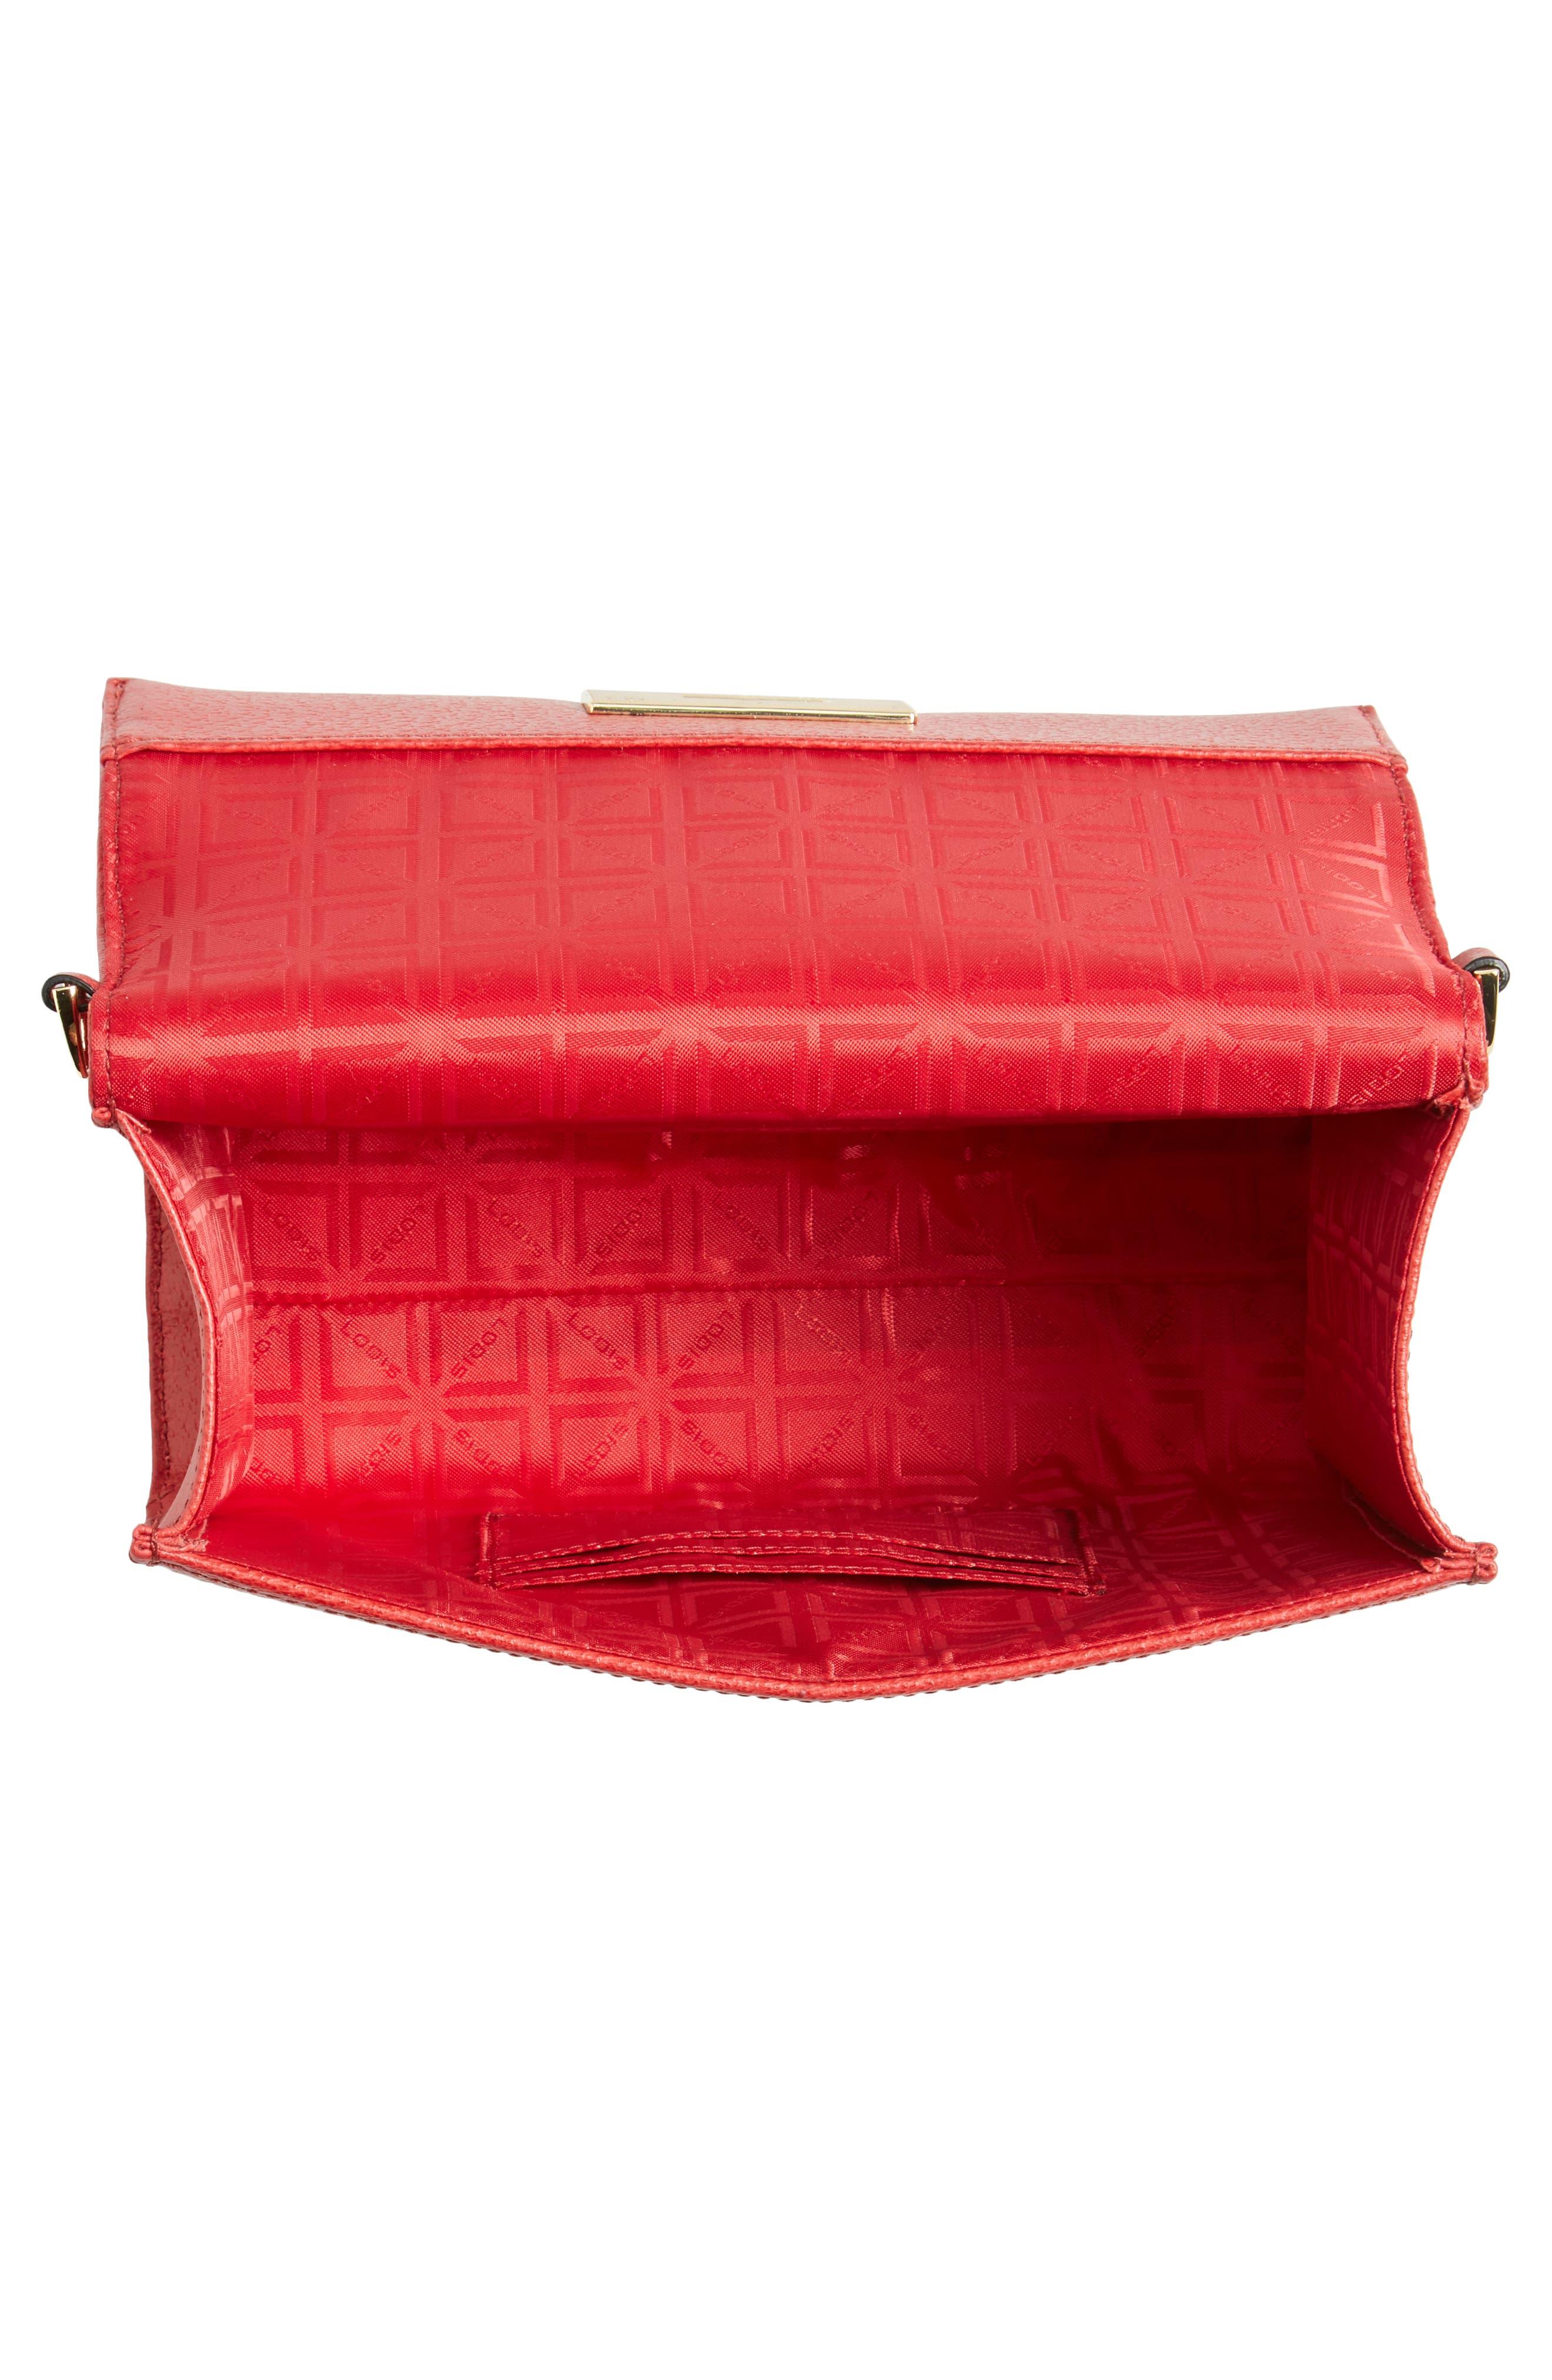 LODIS Stephanie Under Lock & Key - Small Eden Leather Crossbody Bag,                             Alternate thumbnail 4, color,                             600